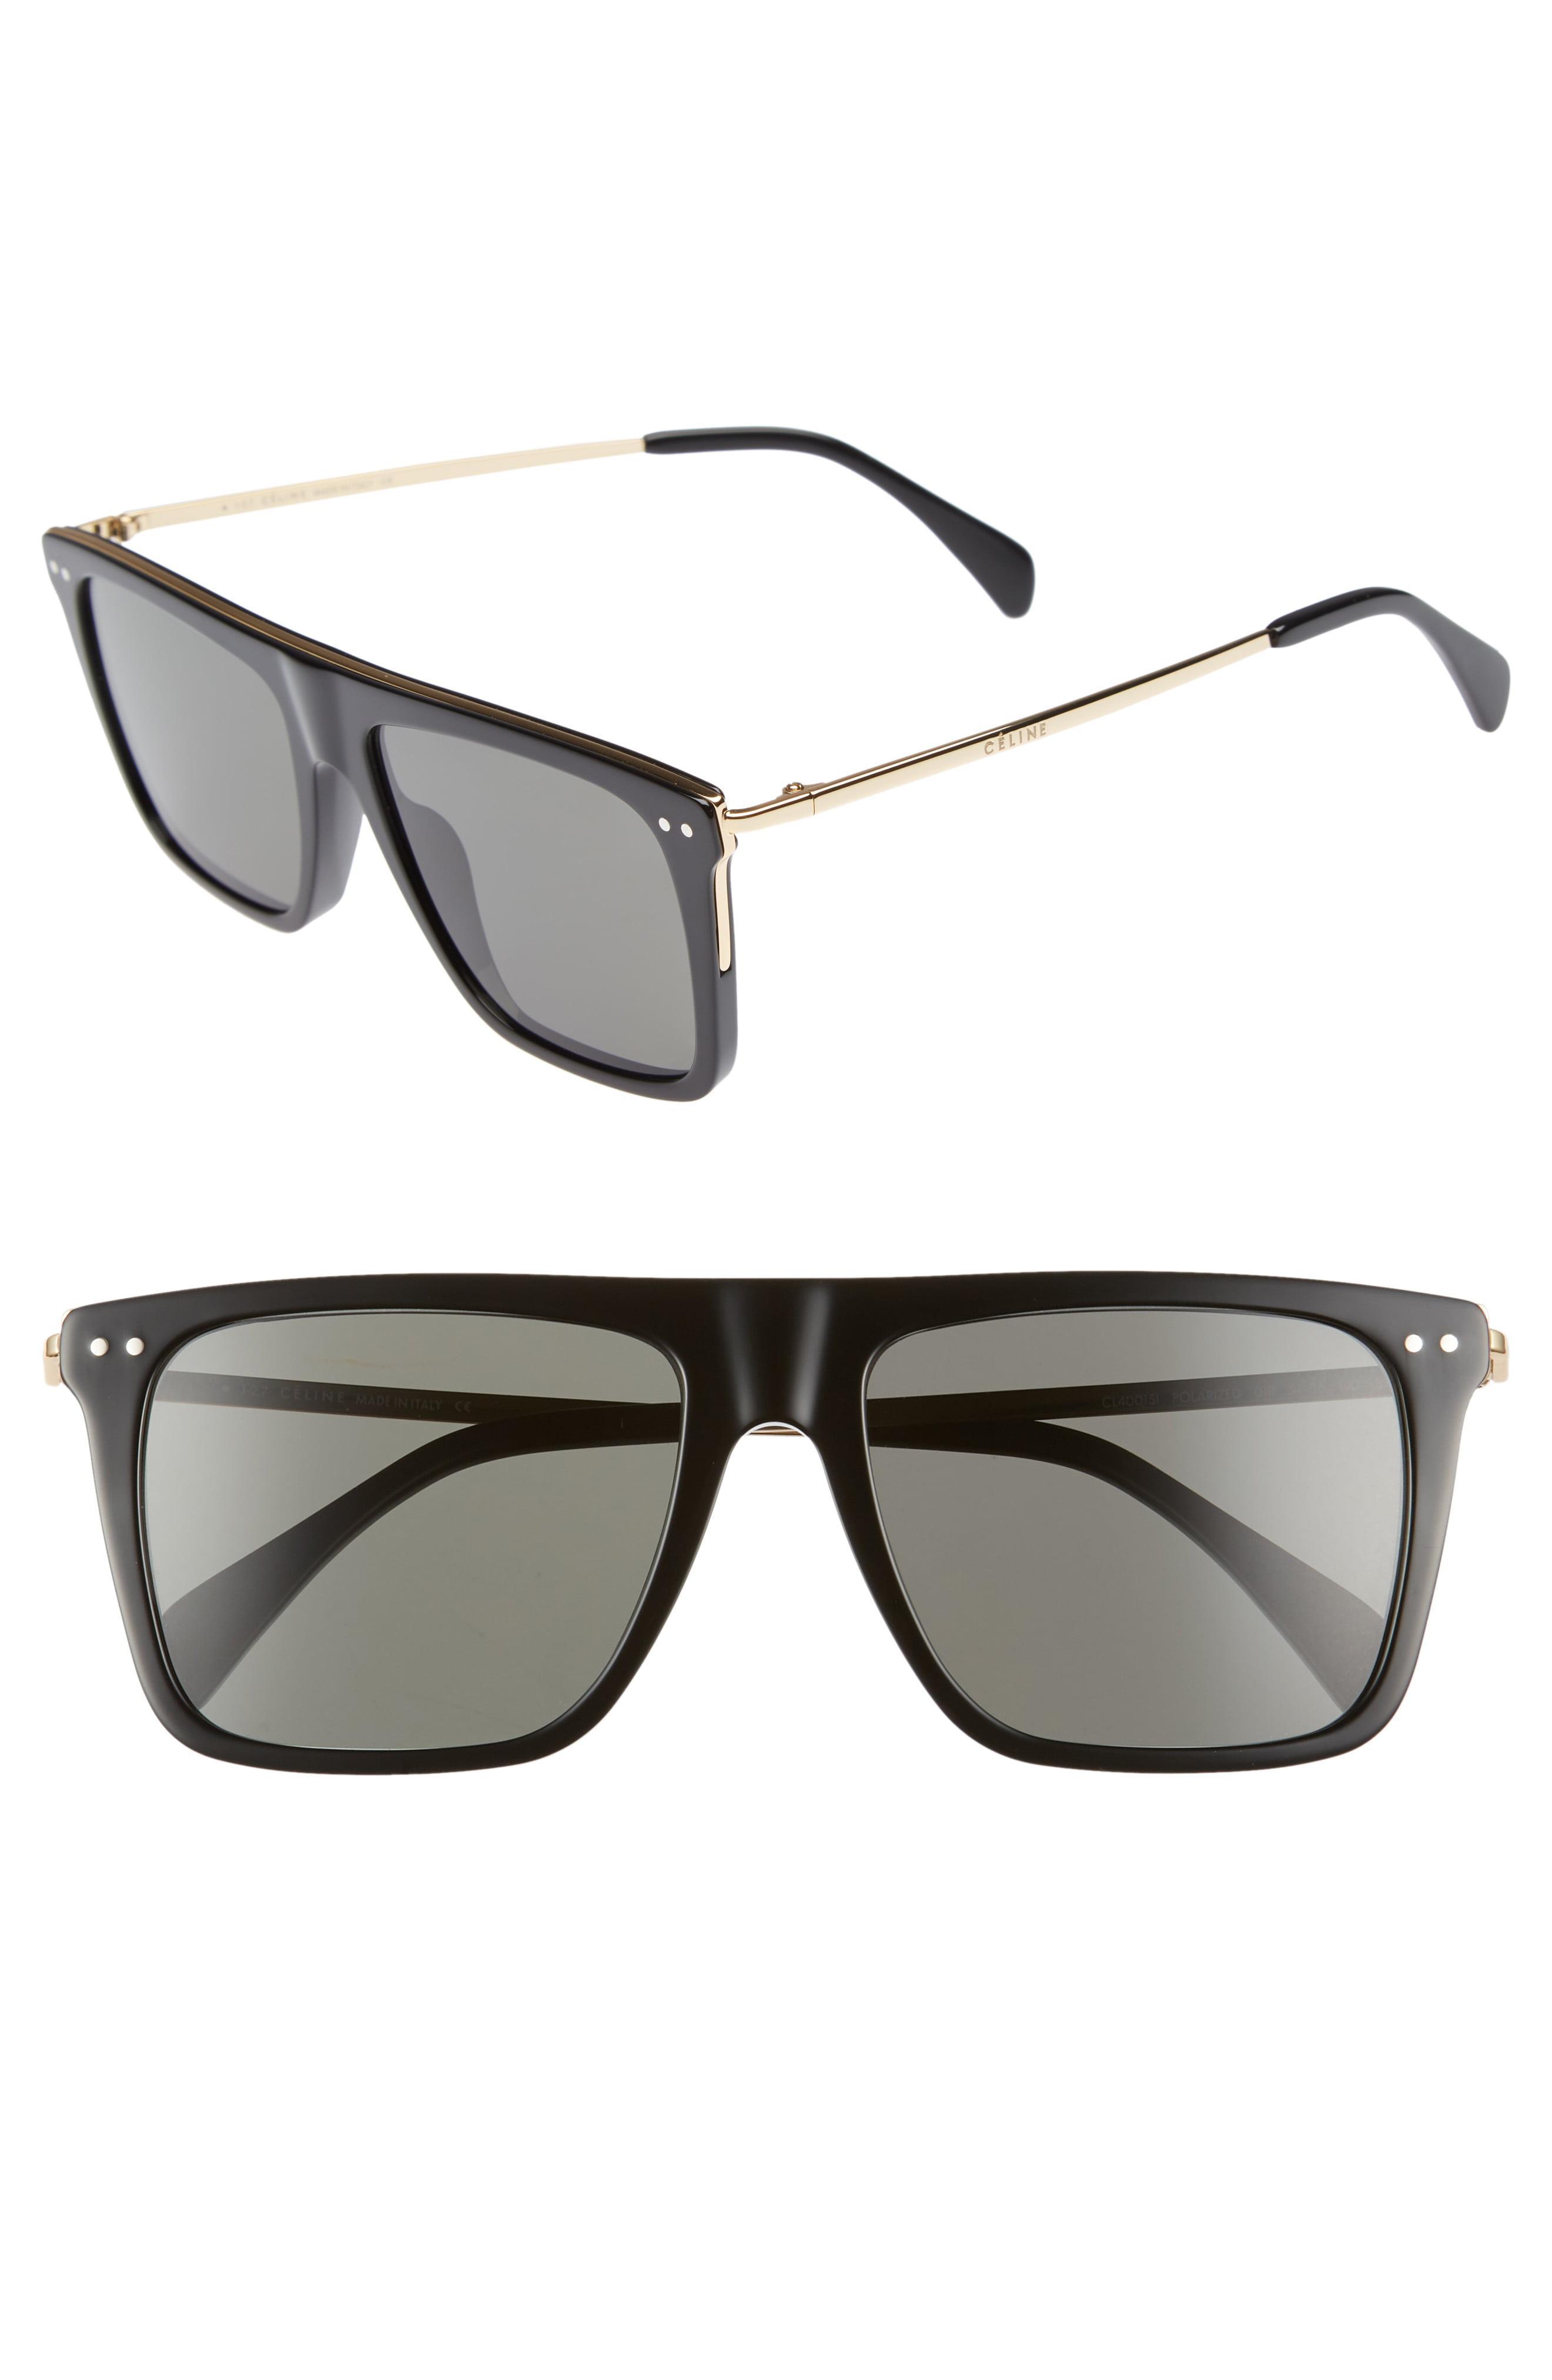 279a39e3a160f Céline. Women s 54mm Polarized Flat Top Sunglasses